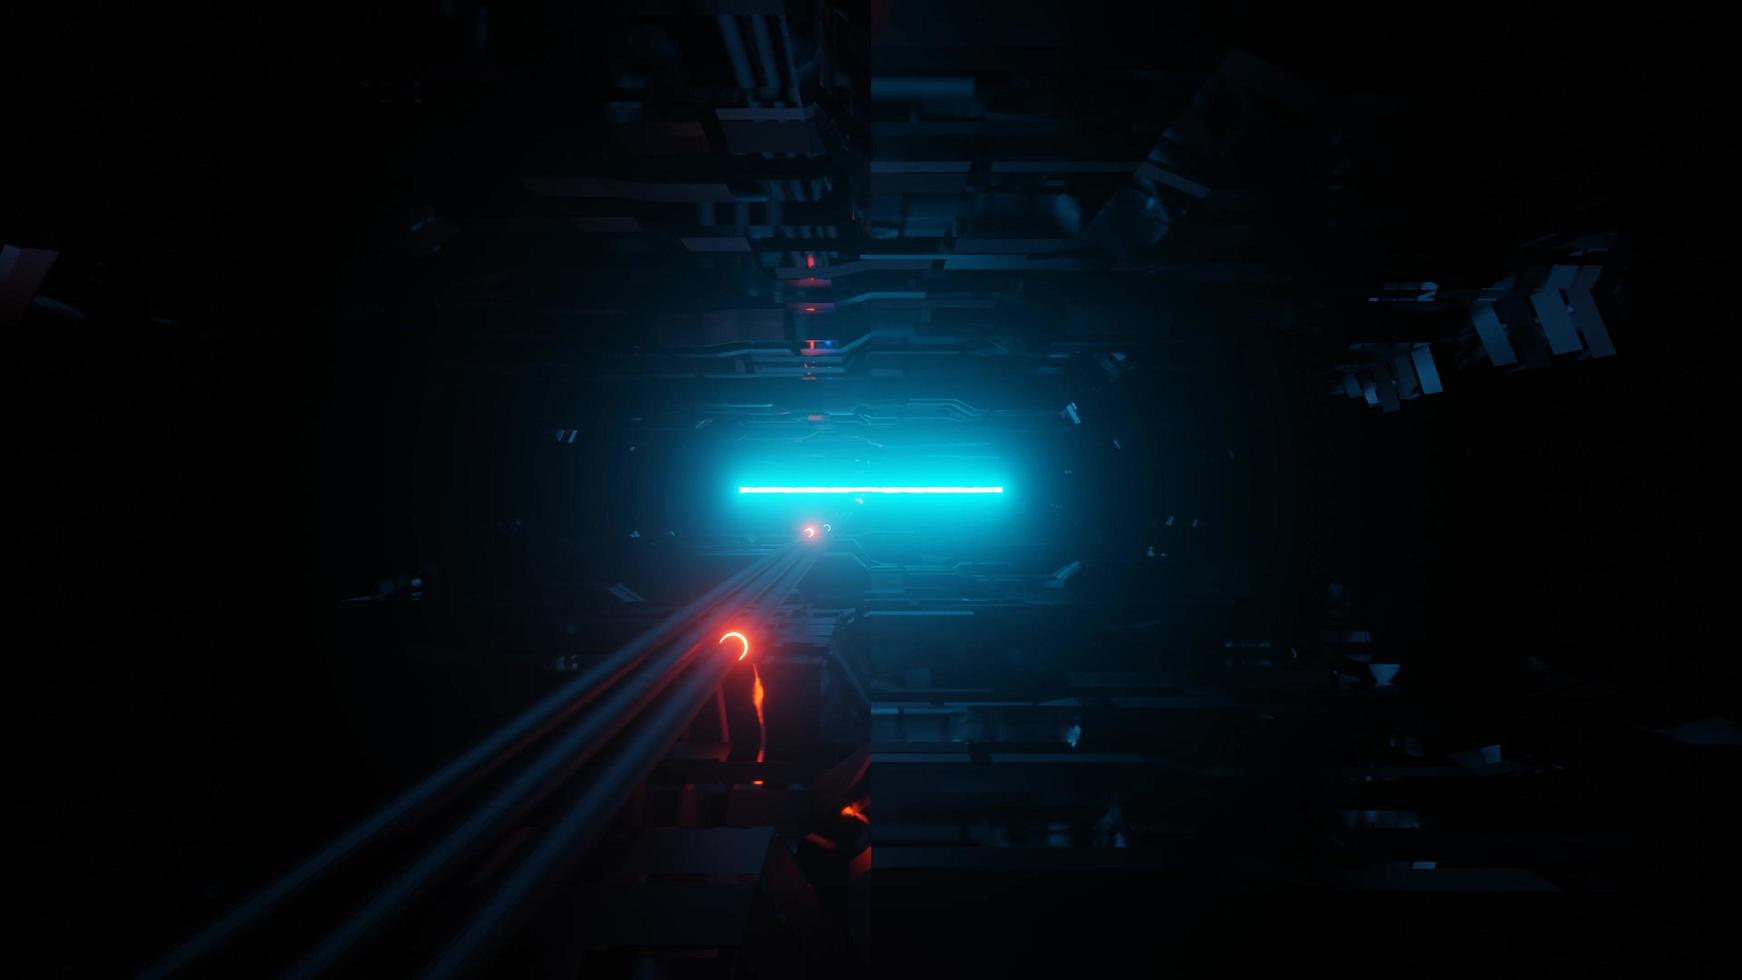 futuristische sci-fi wallpaper achtergrond foto